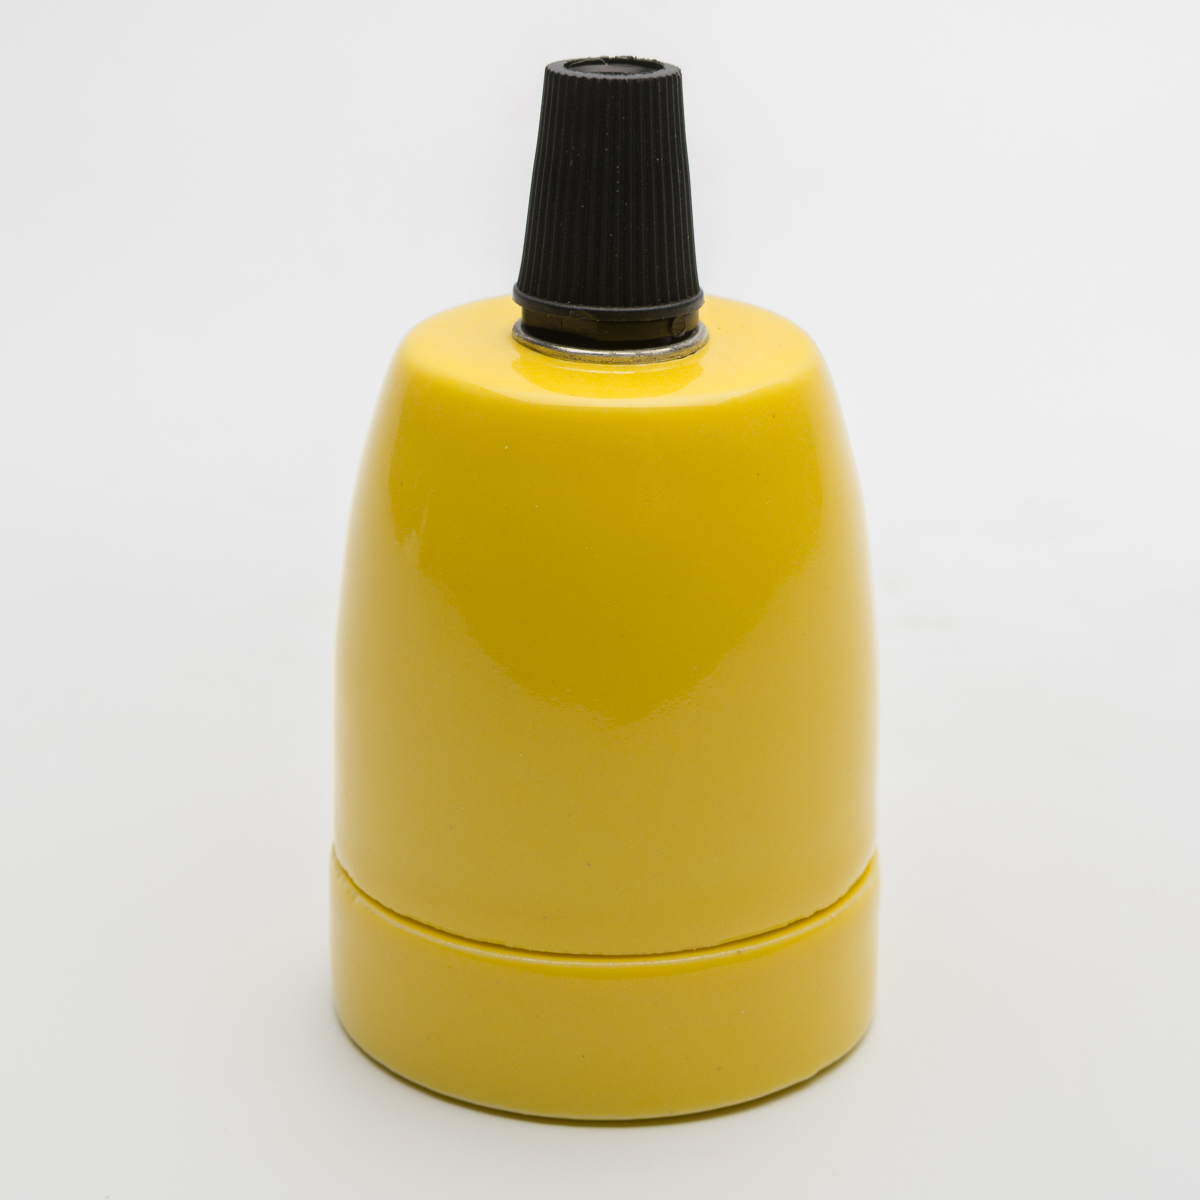 Патрон керамический желтый